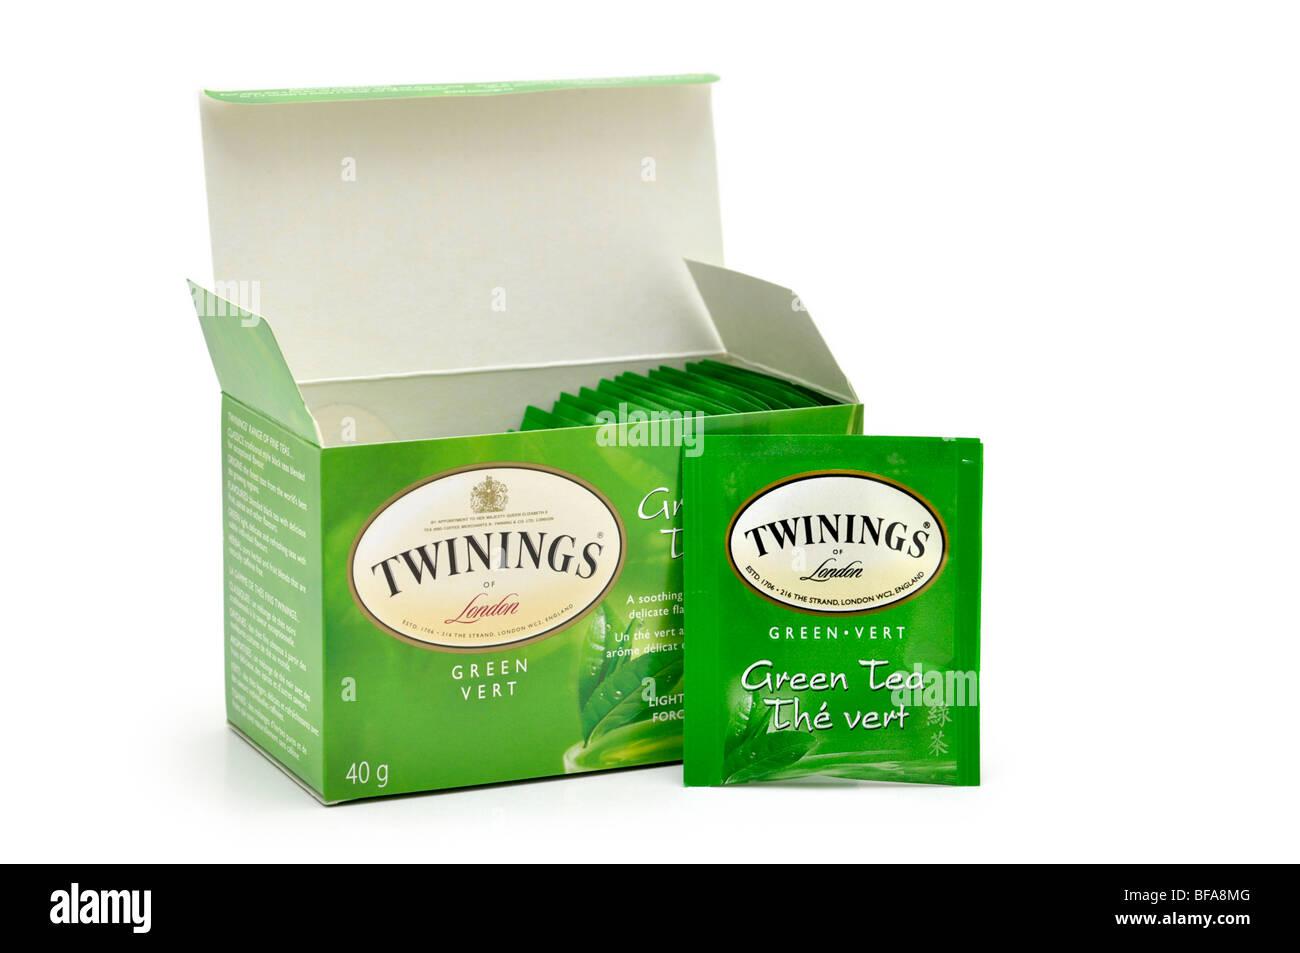 Twinings Green Tea Stock Photos Amp Twinings Green Tea Stock